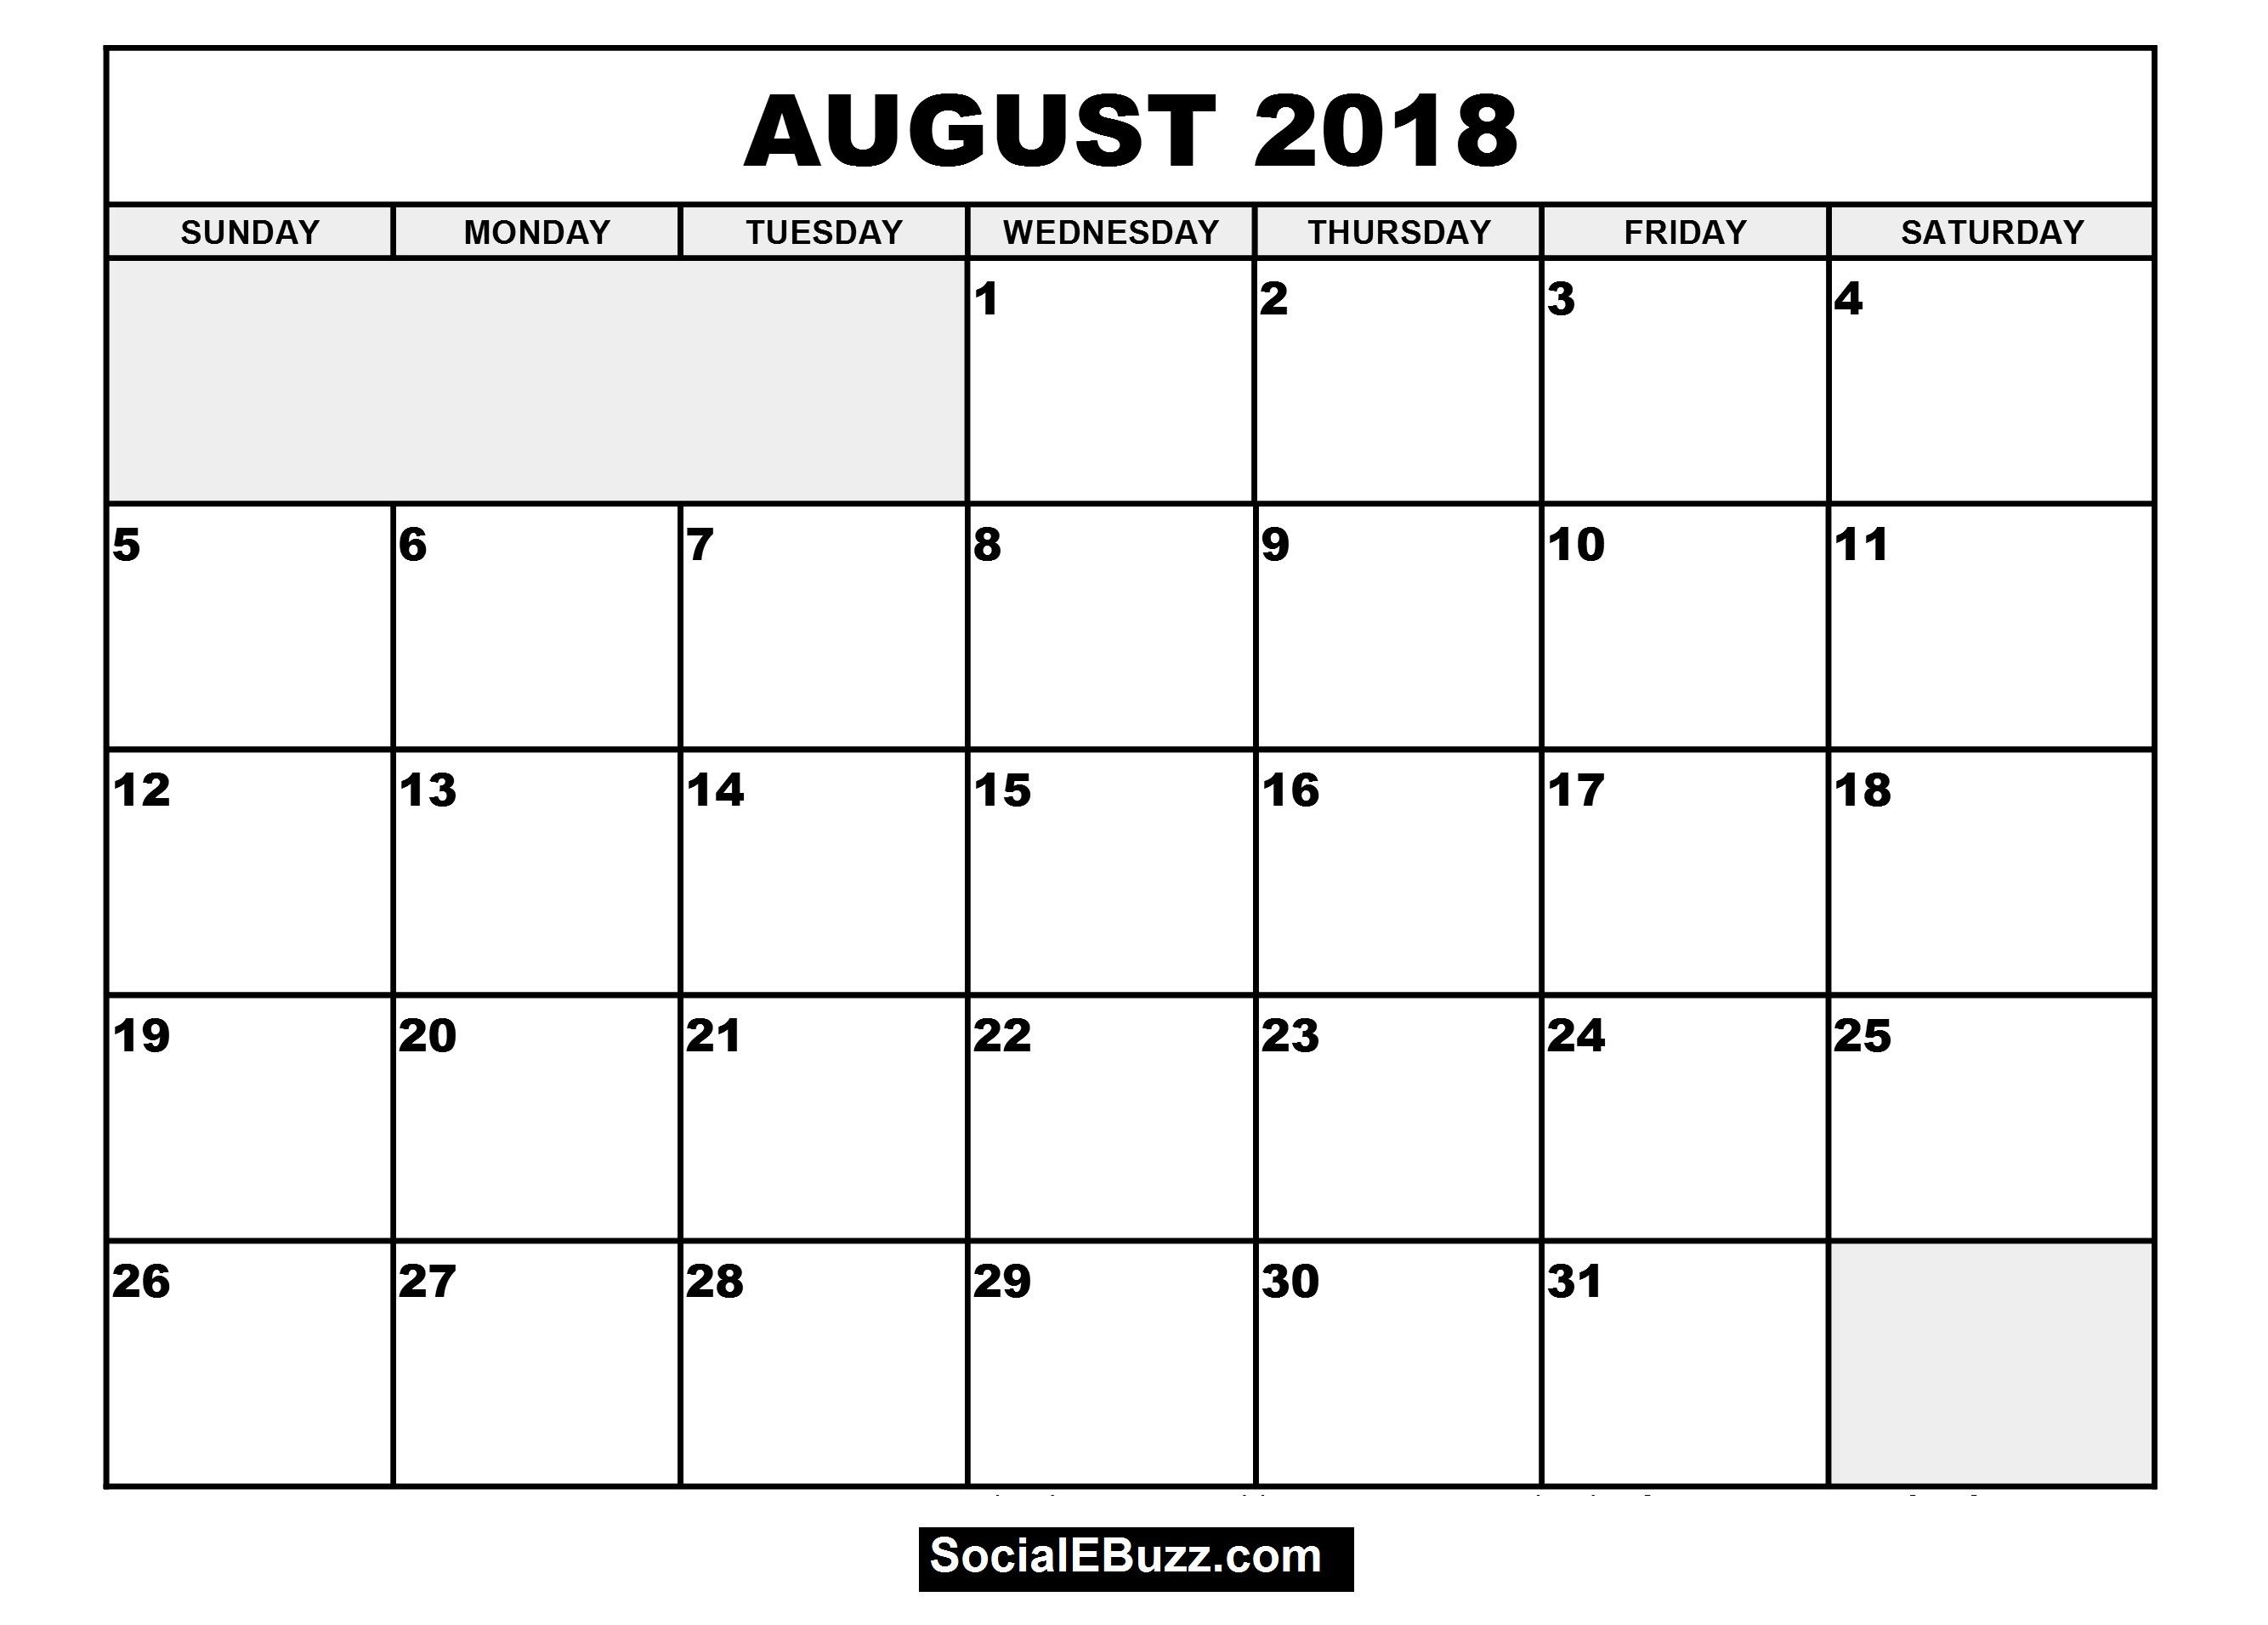 August 2018 Calendar Printable Template | August 2018 Calendar Blank within Blank Calendars For August